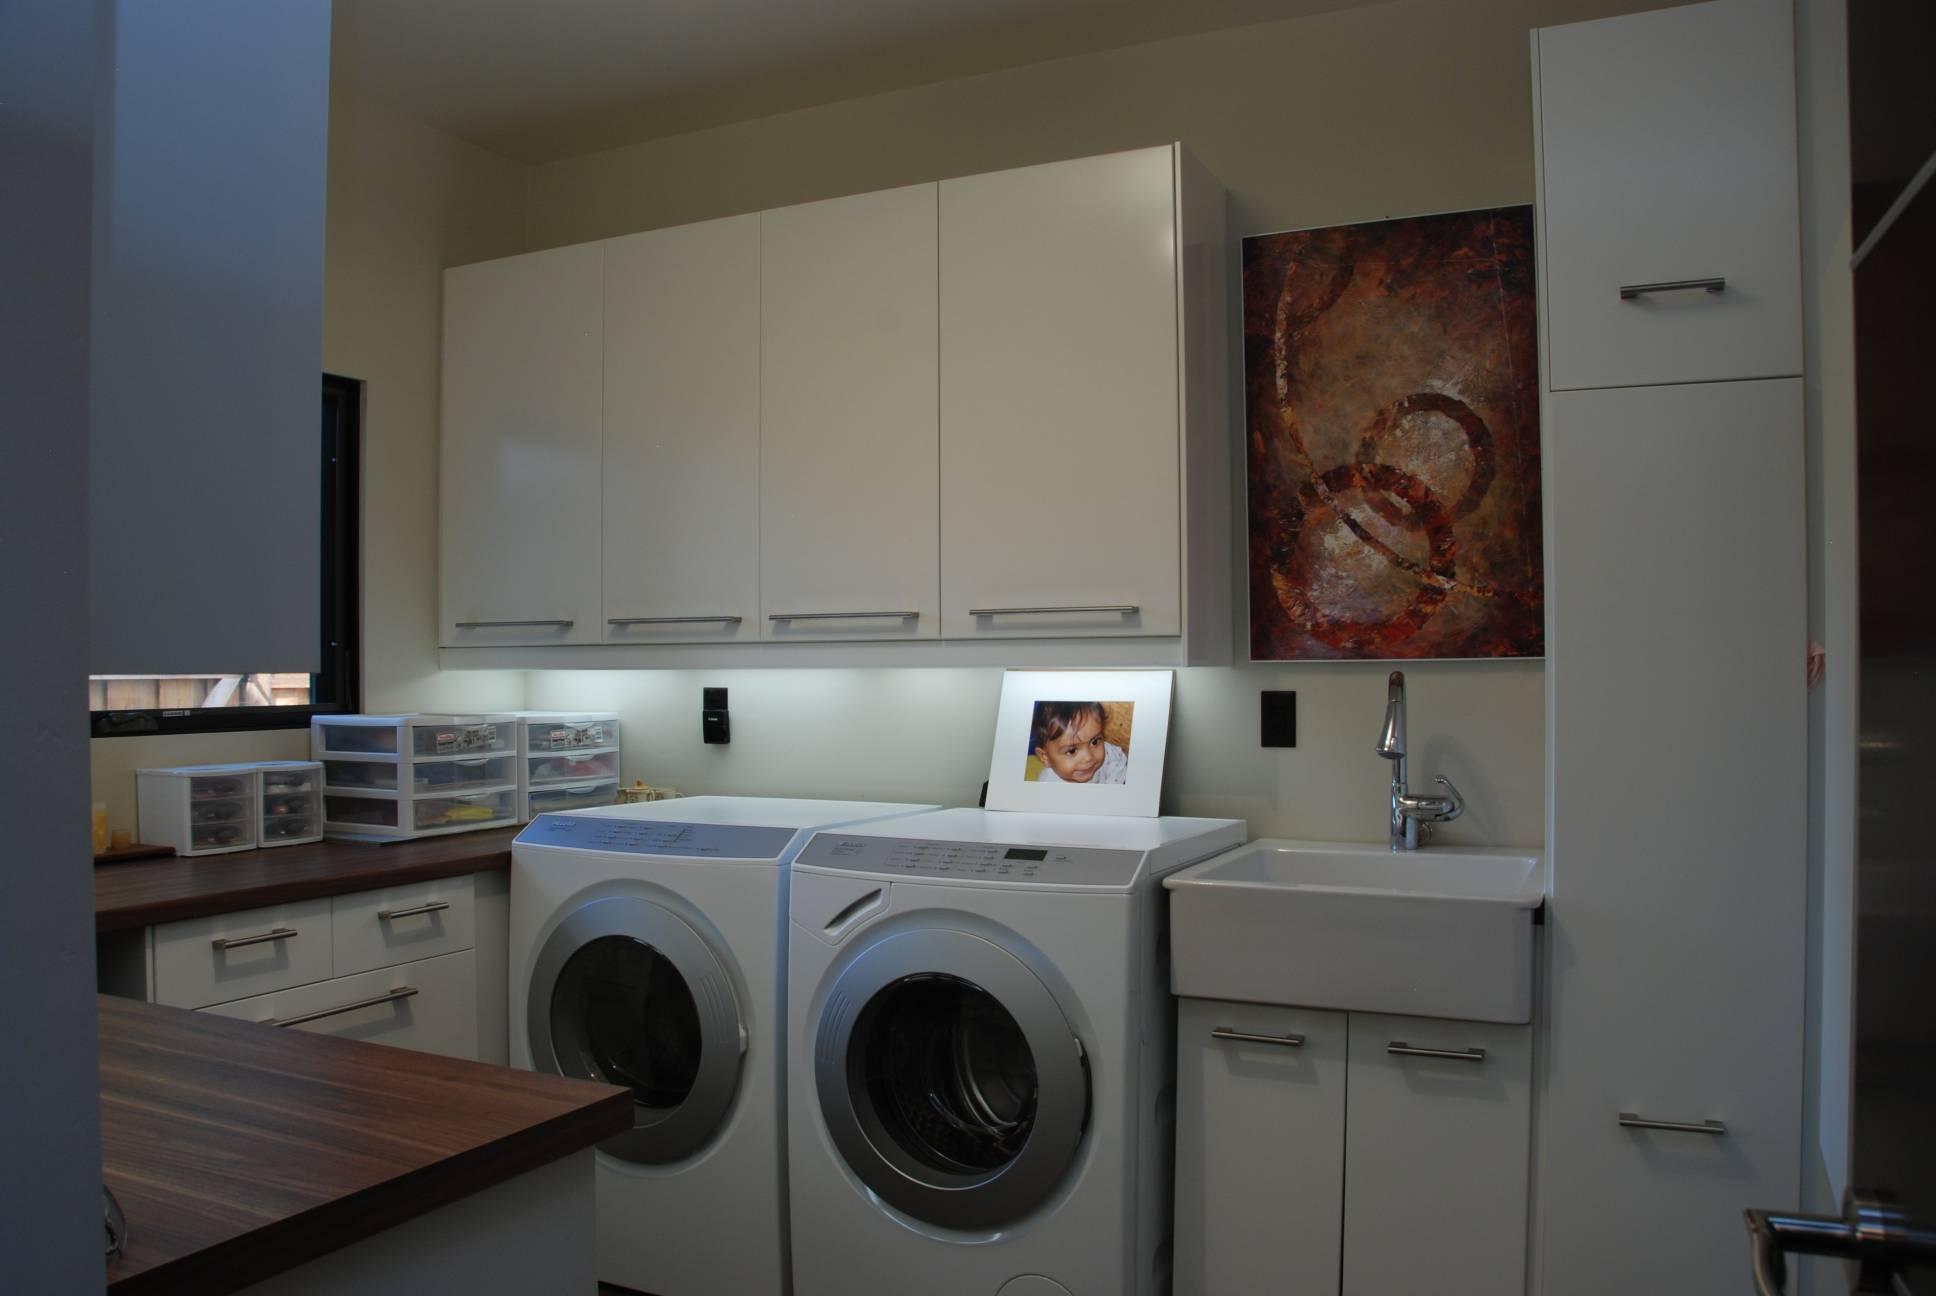 Utility washer dryer room storage, architect work, Los Altos